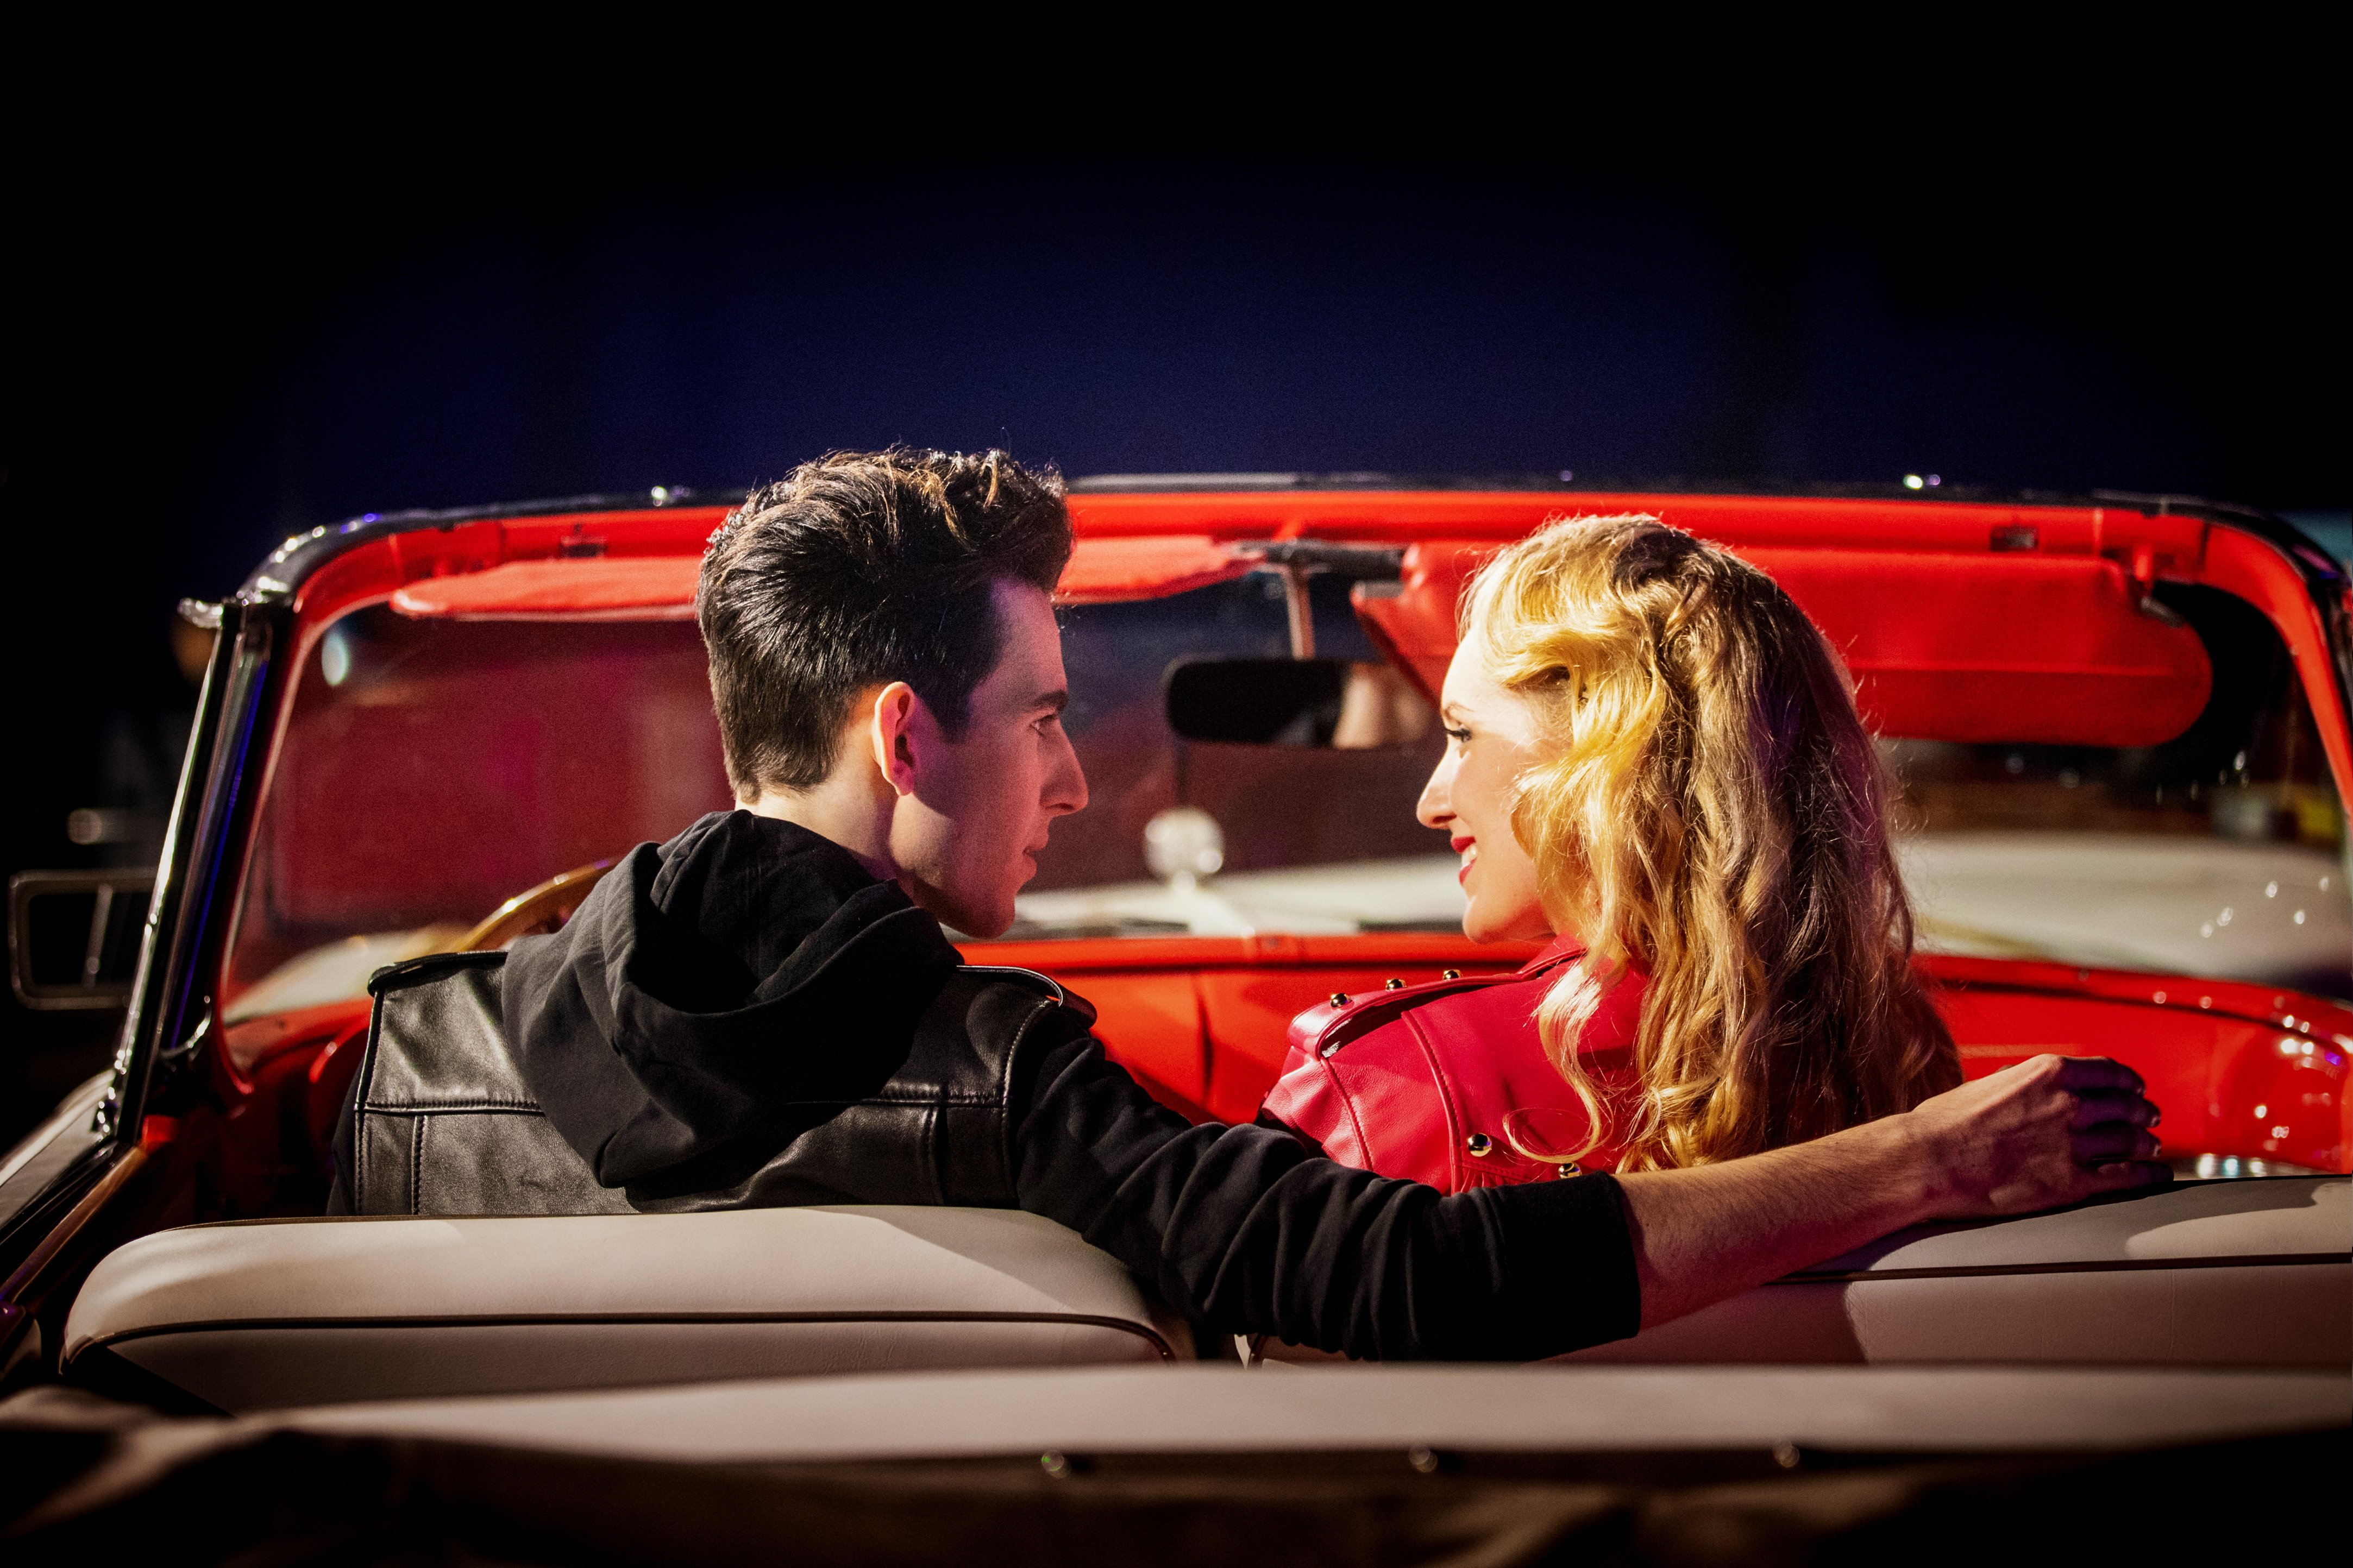 Pablo Ounaskari (Danny) ja Petra Pääkkönen (Sandy)